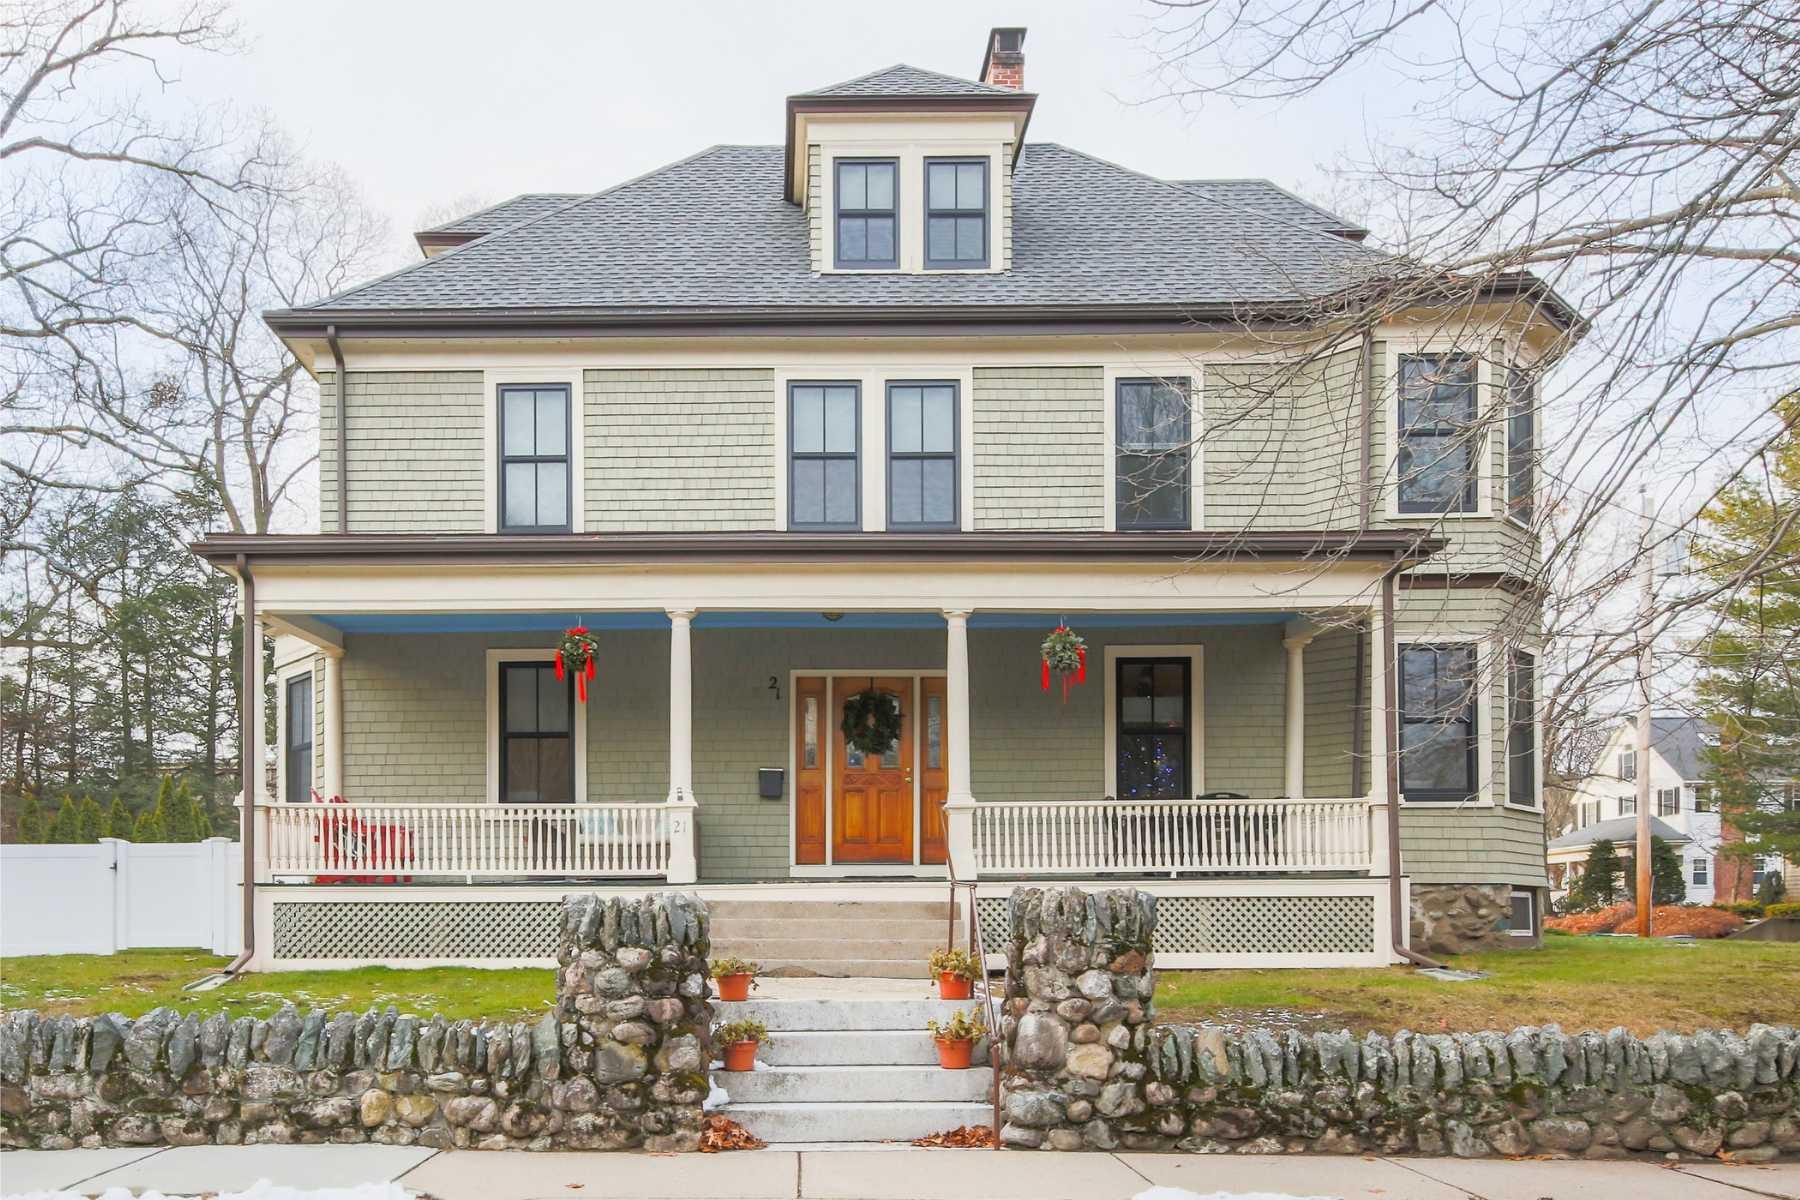 Newton Single Family Home - Single Family Home in Newton, MA